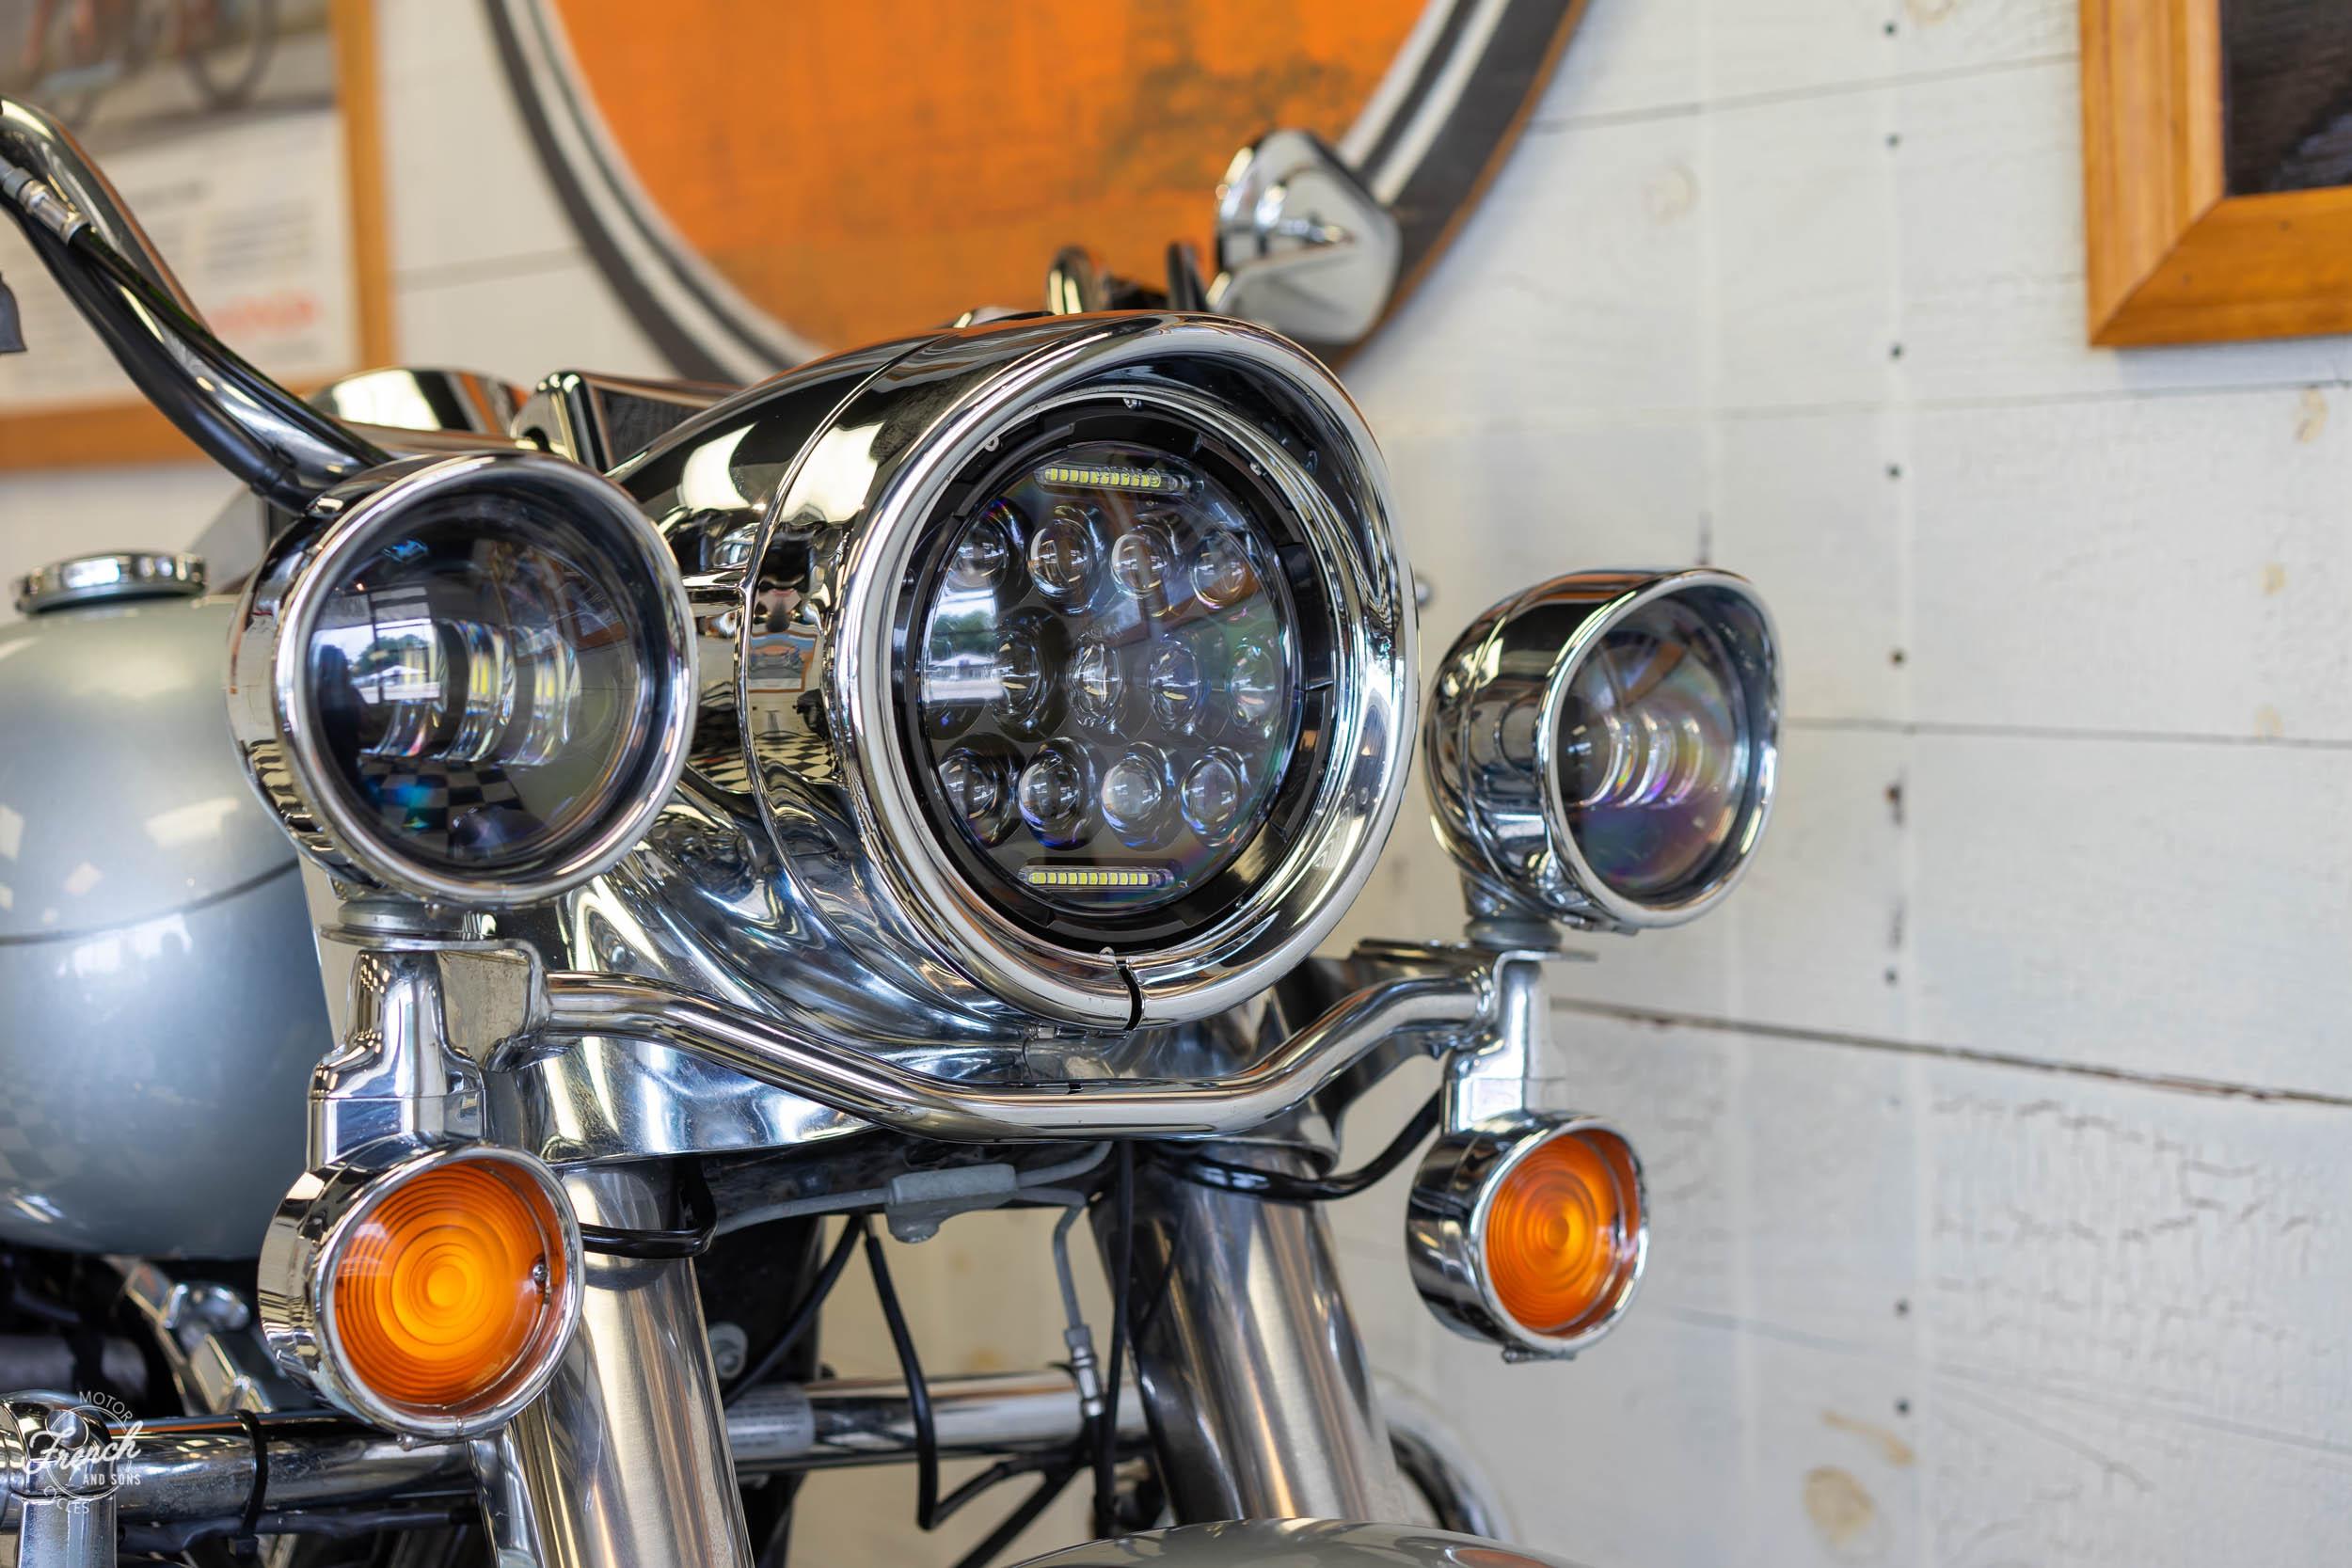 2011_Harley_davidson_road_king_silver-14.jpg